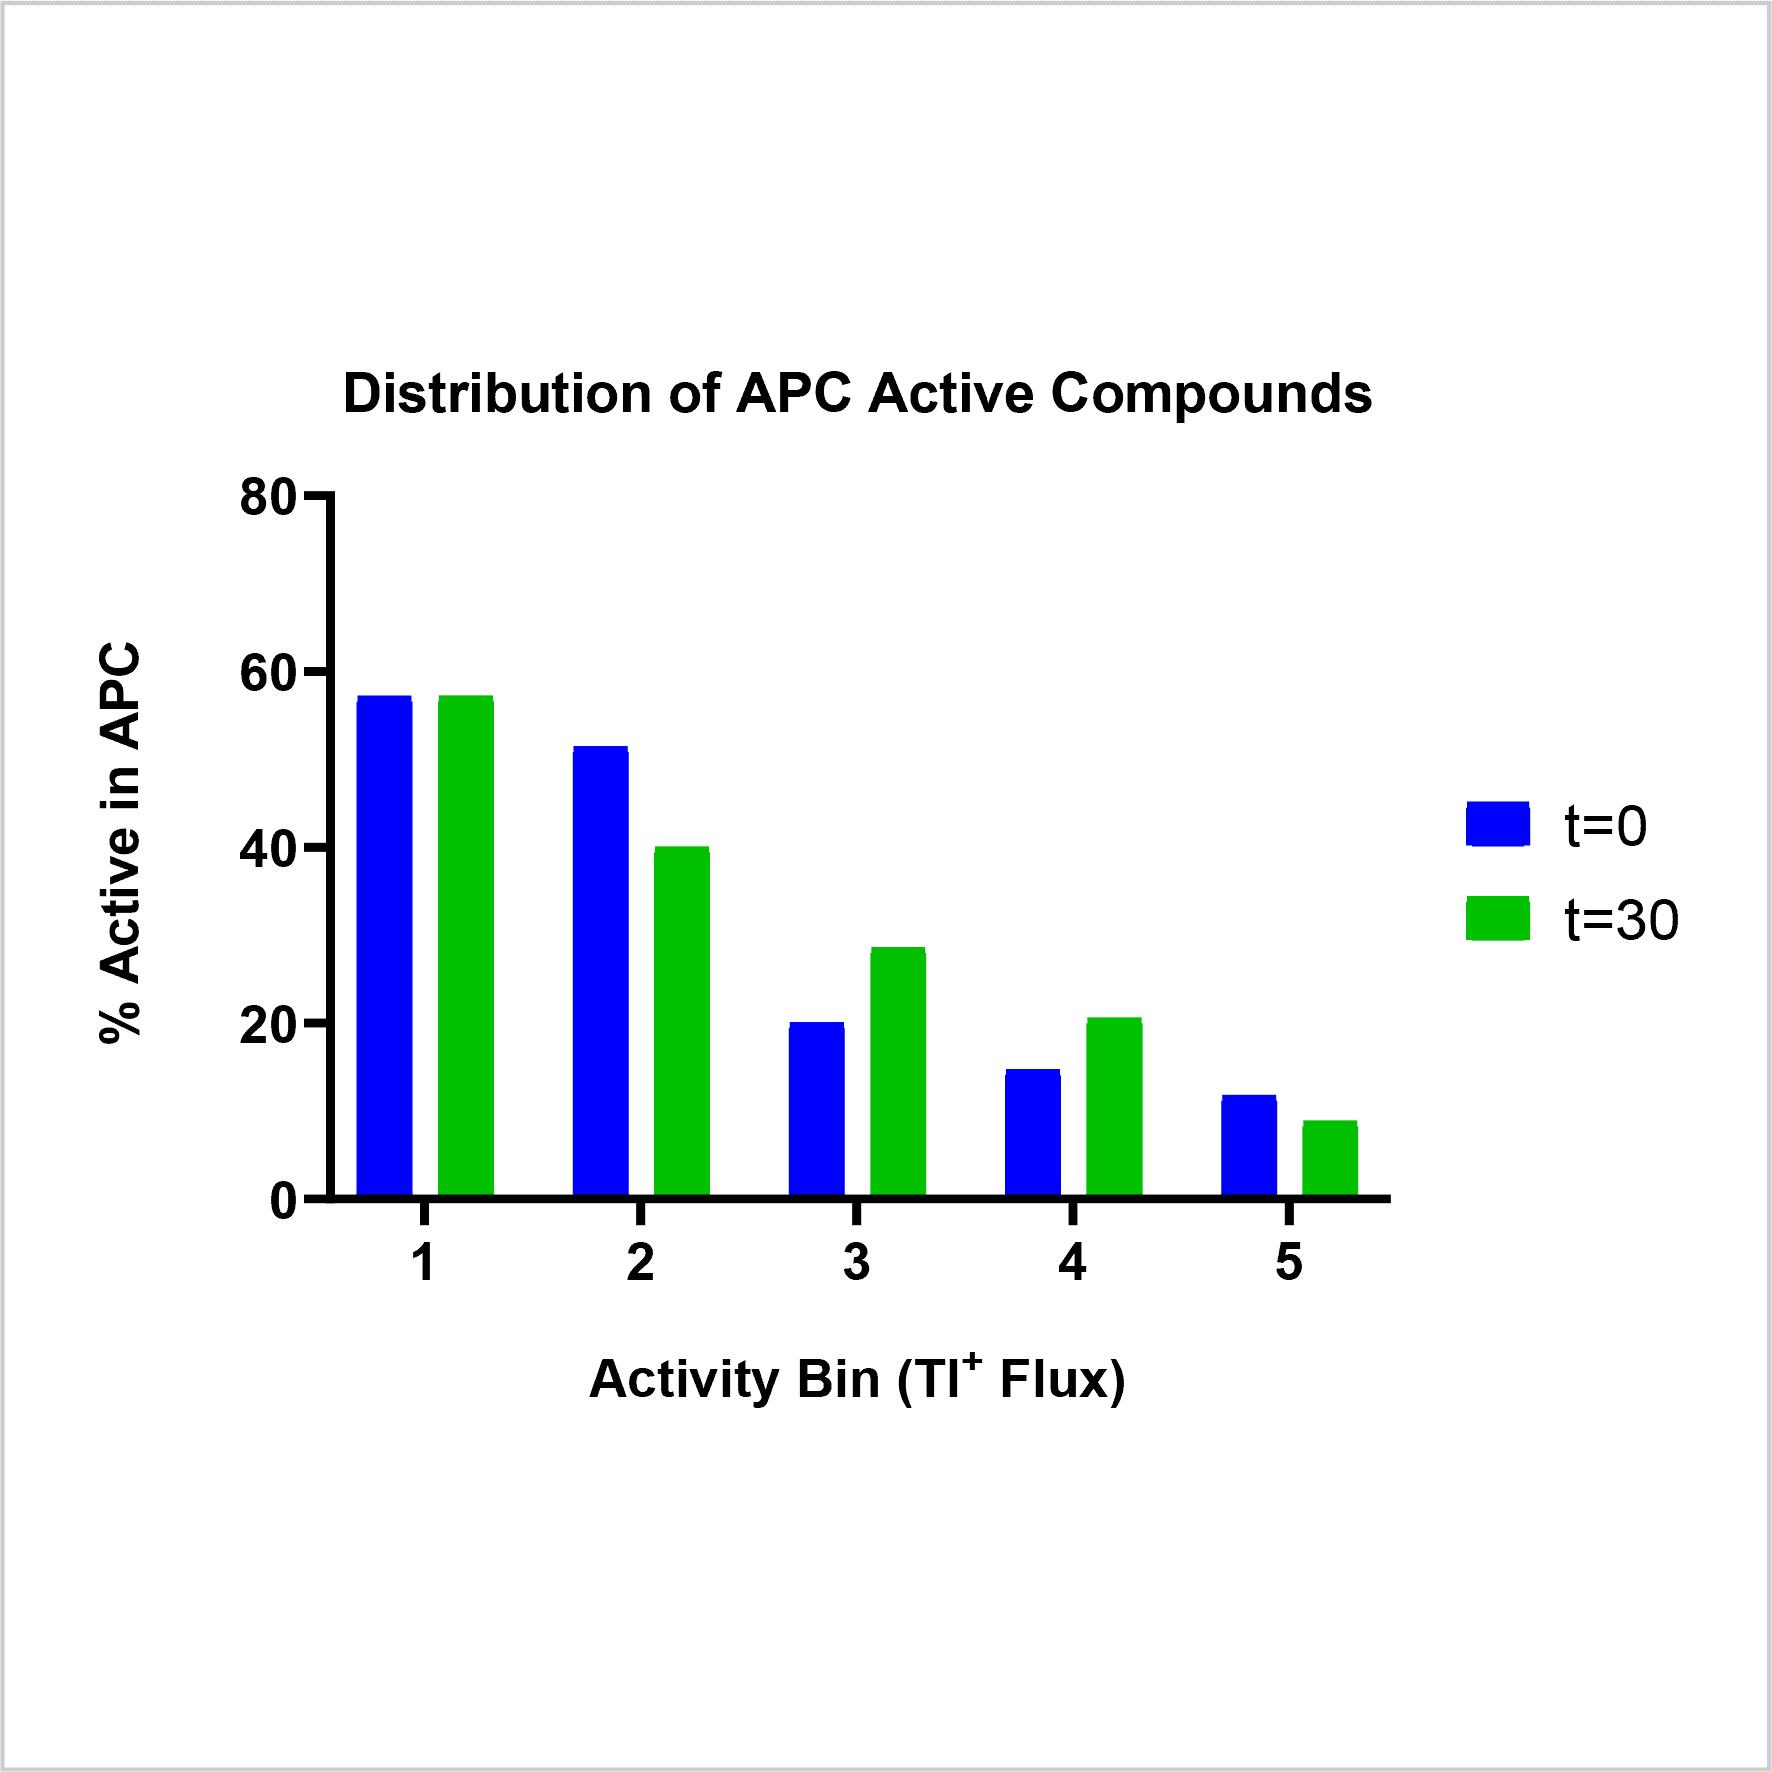 Correlation between thallium flux and APC hit compound activity